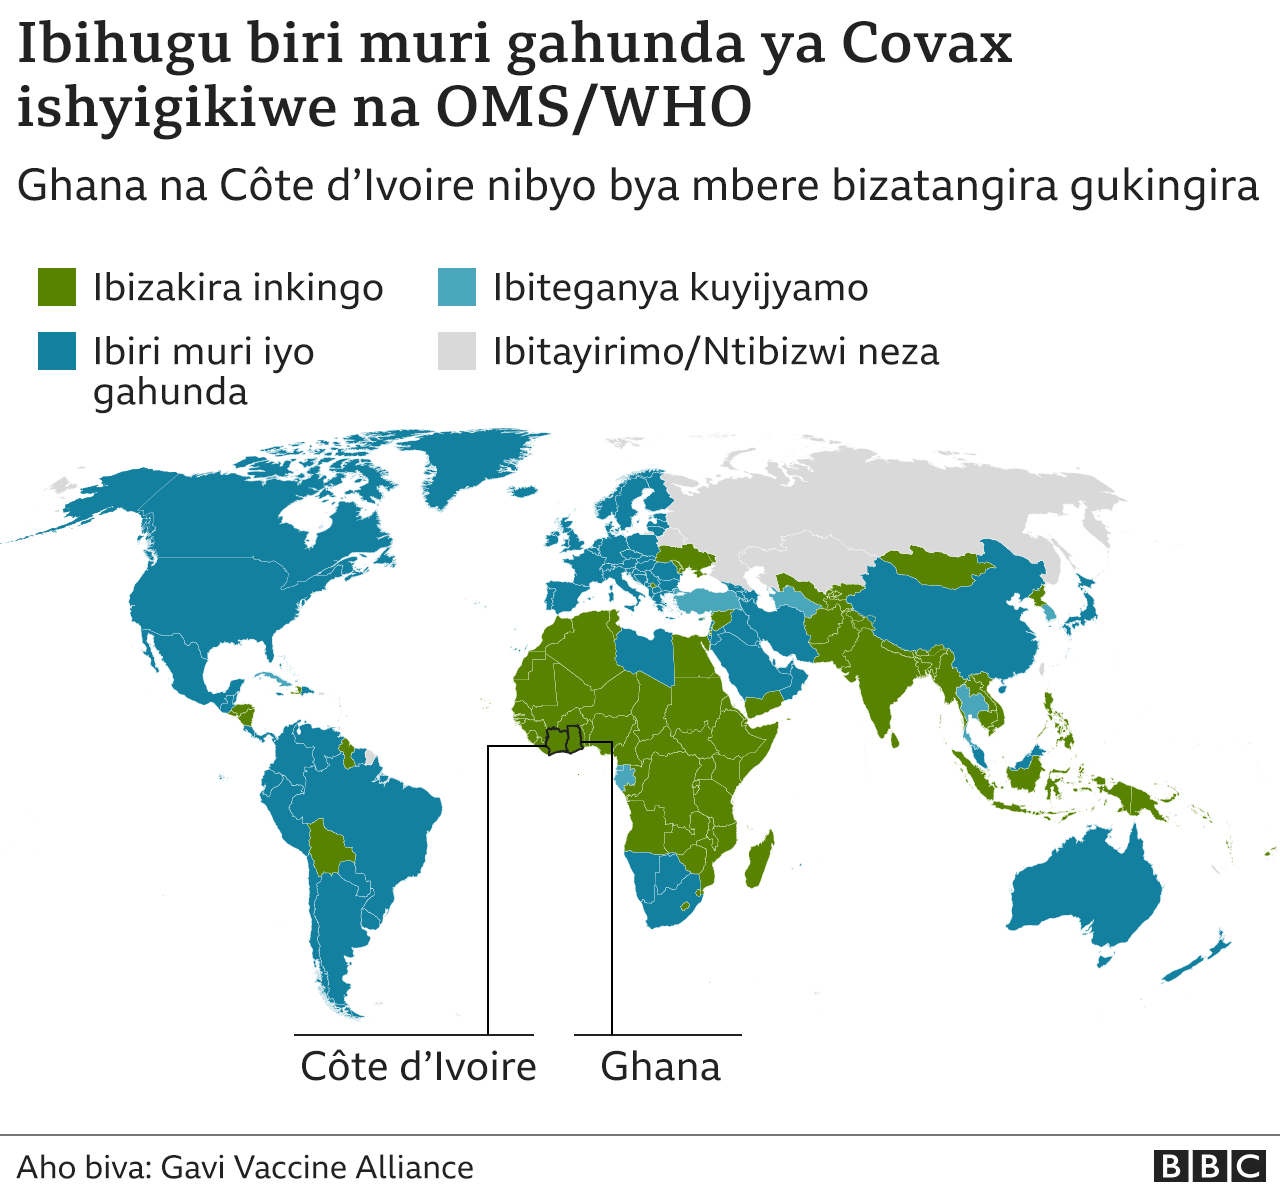 Gahunda ya Covax